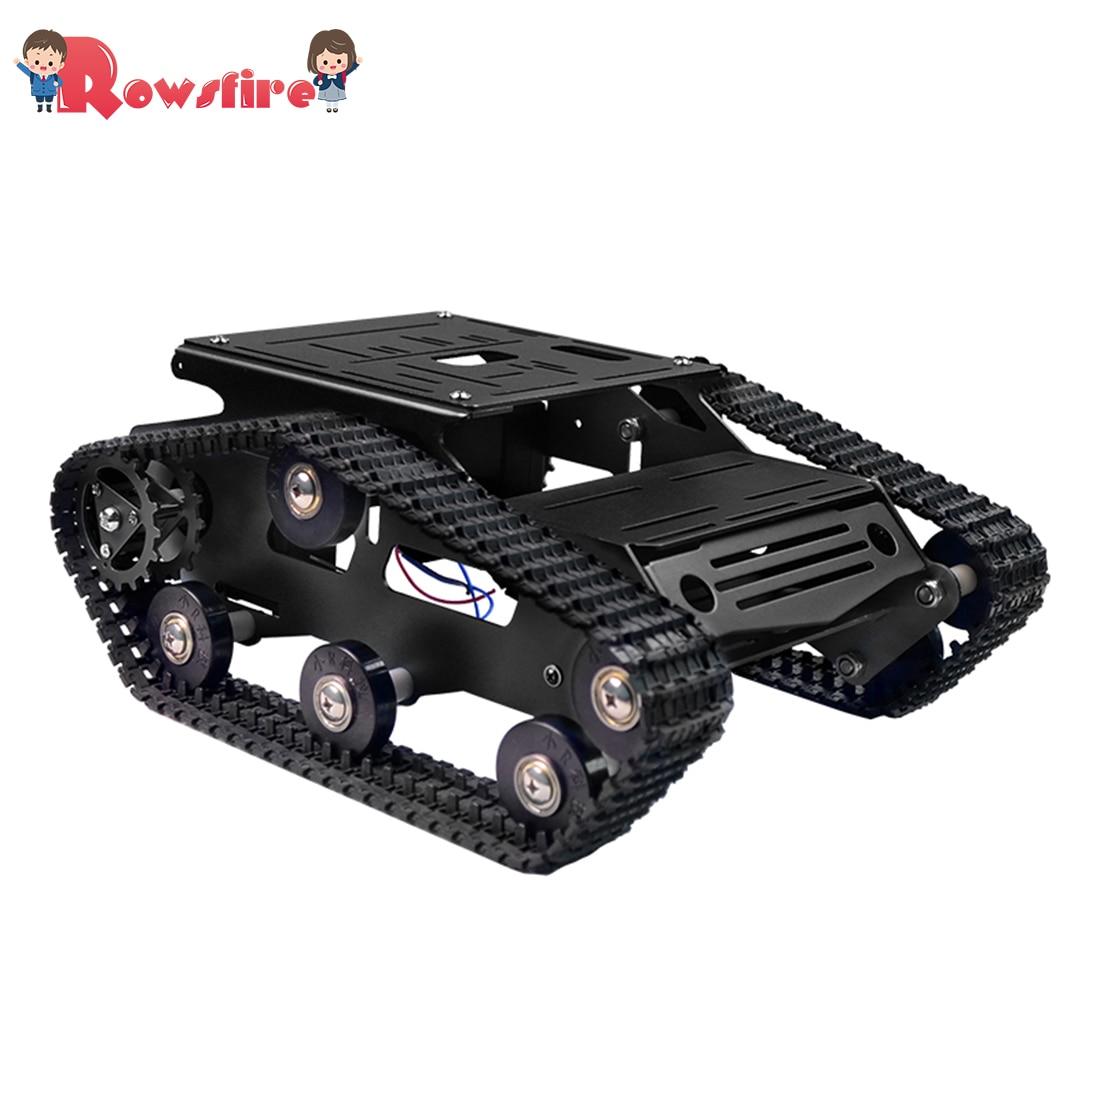 New Hot DIY Smart Robot Tank Crawler Chassis Car Frame Kit - Black/Blue/Red/Green/Golden